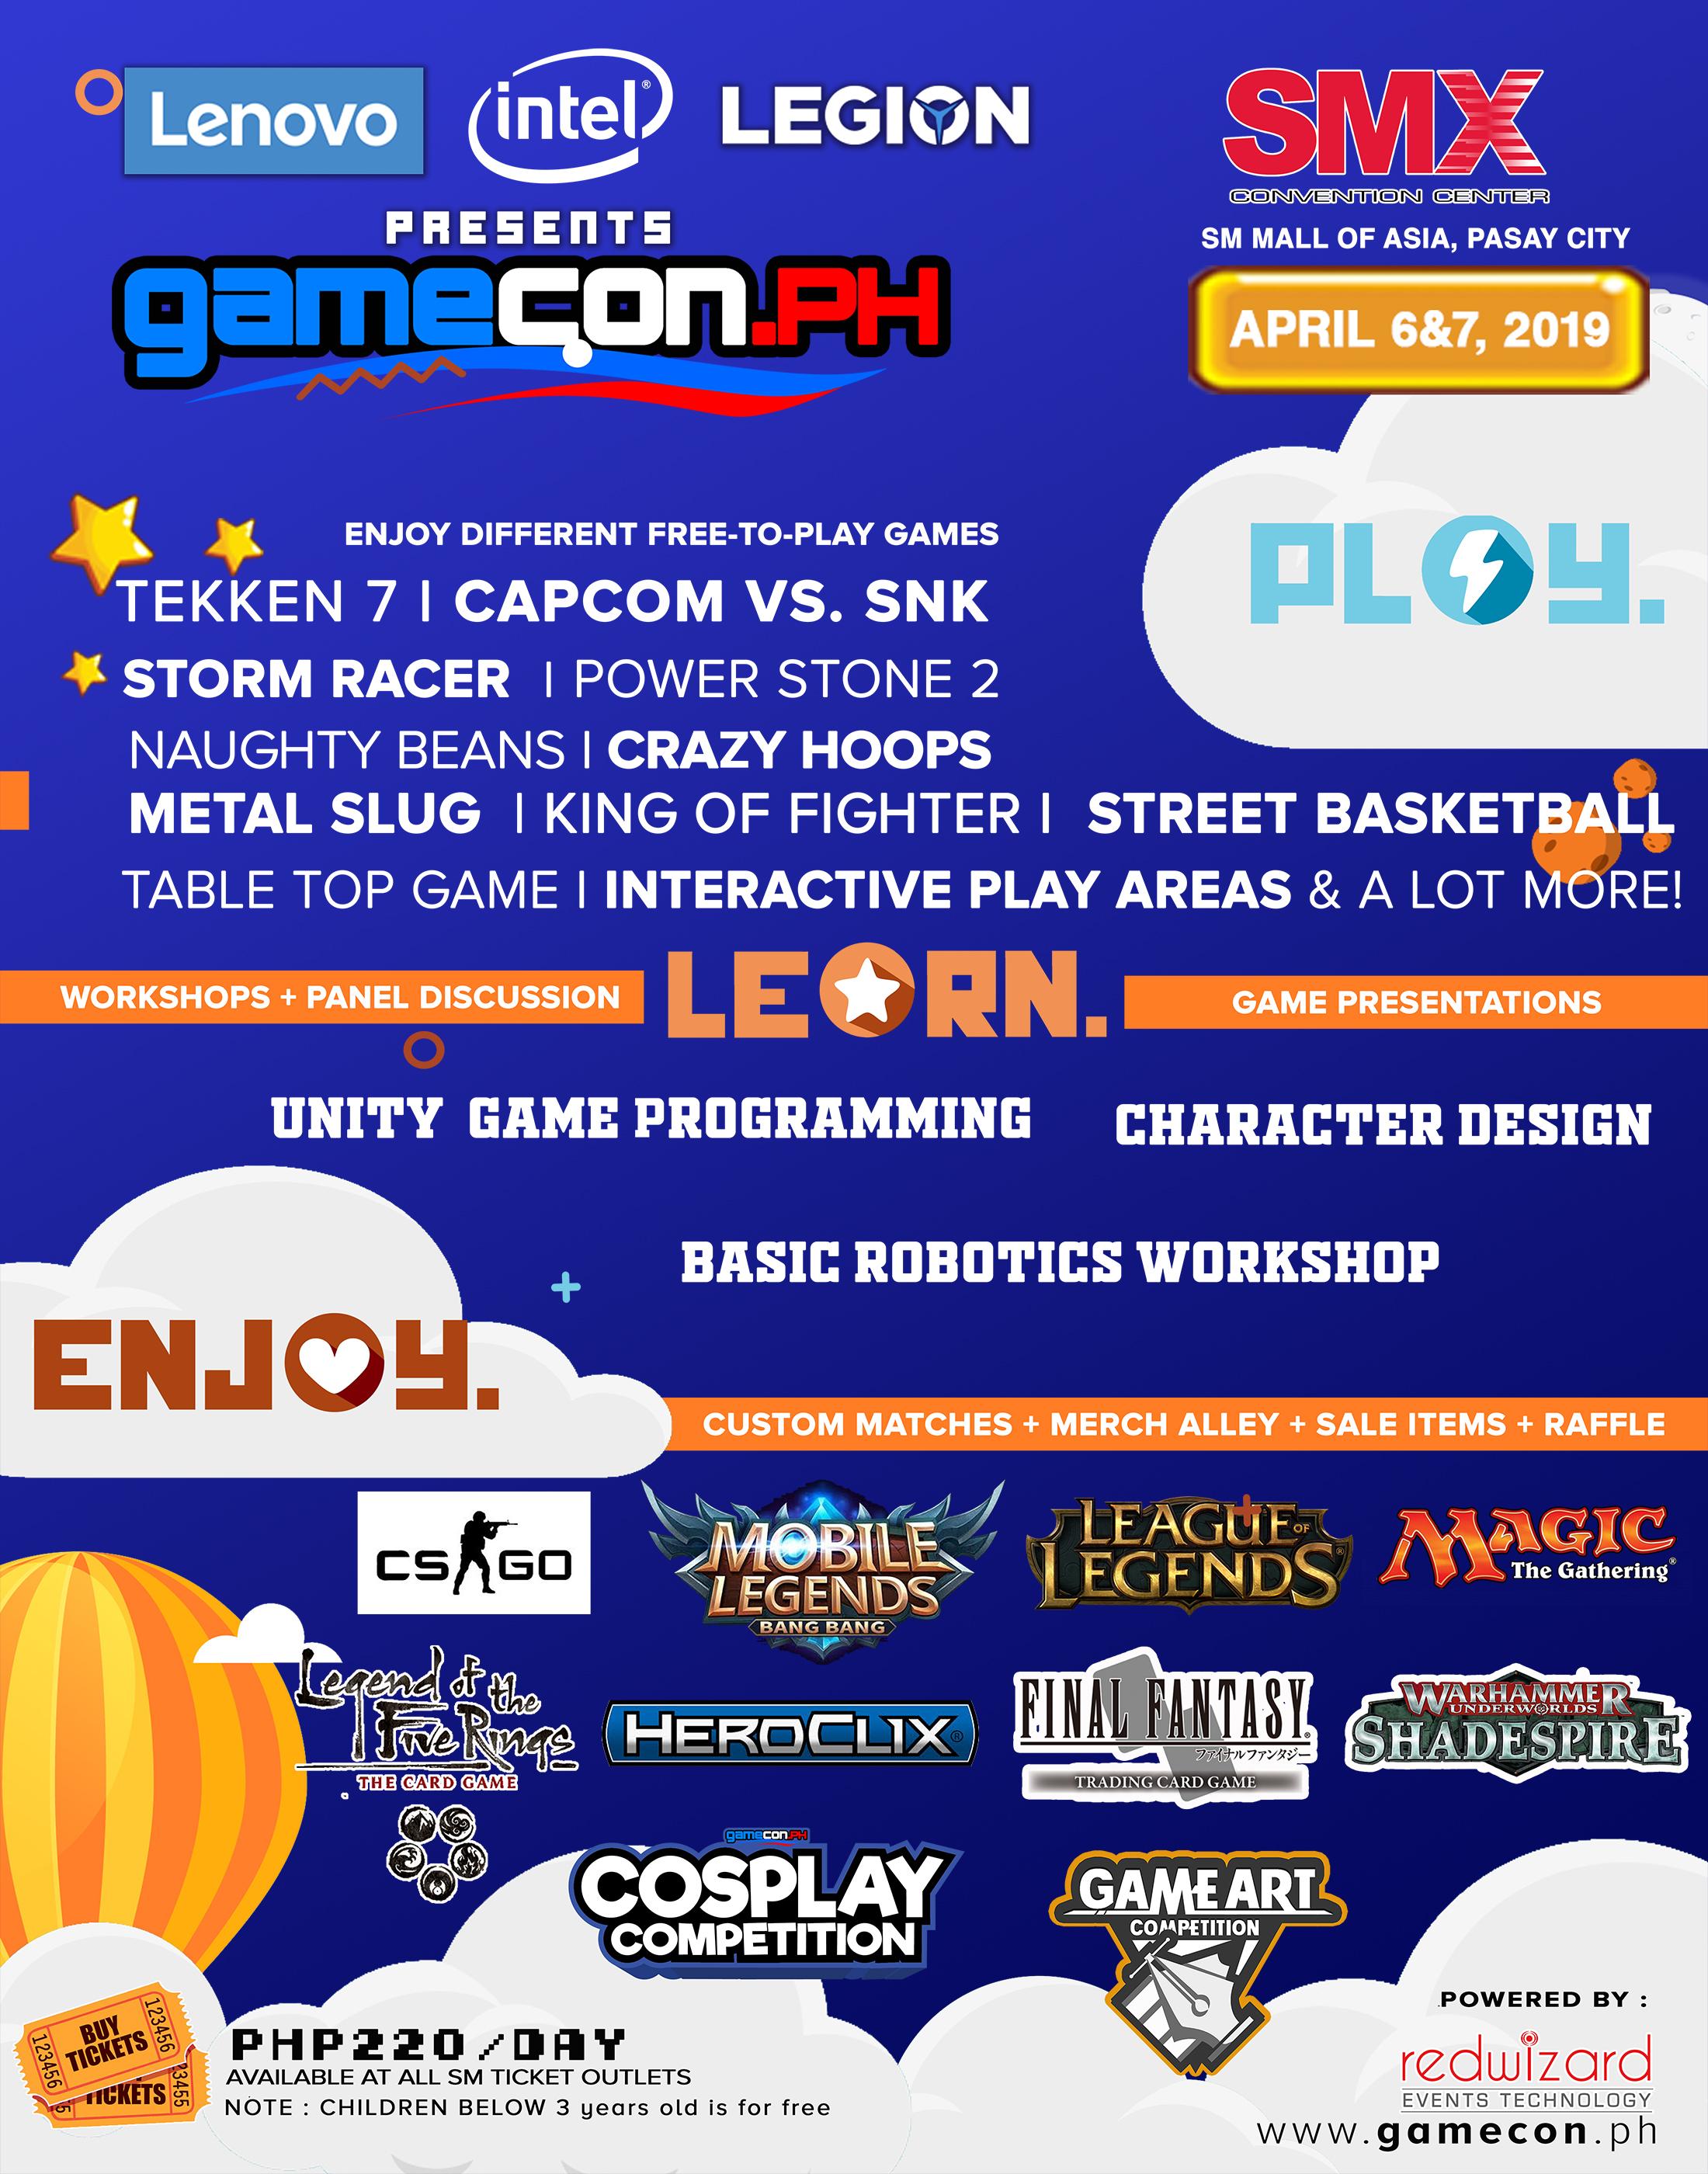 Gamecon Details